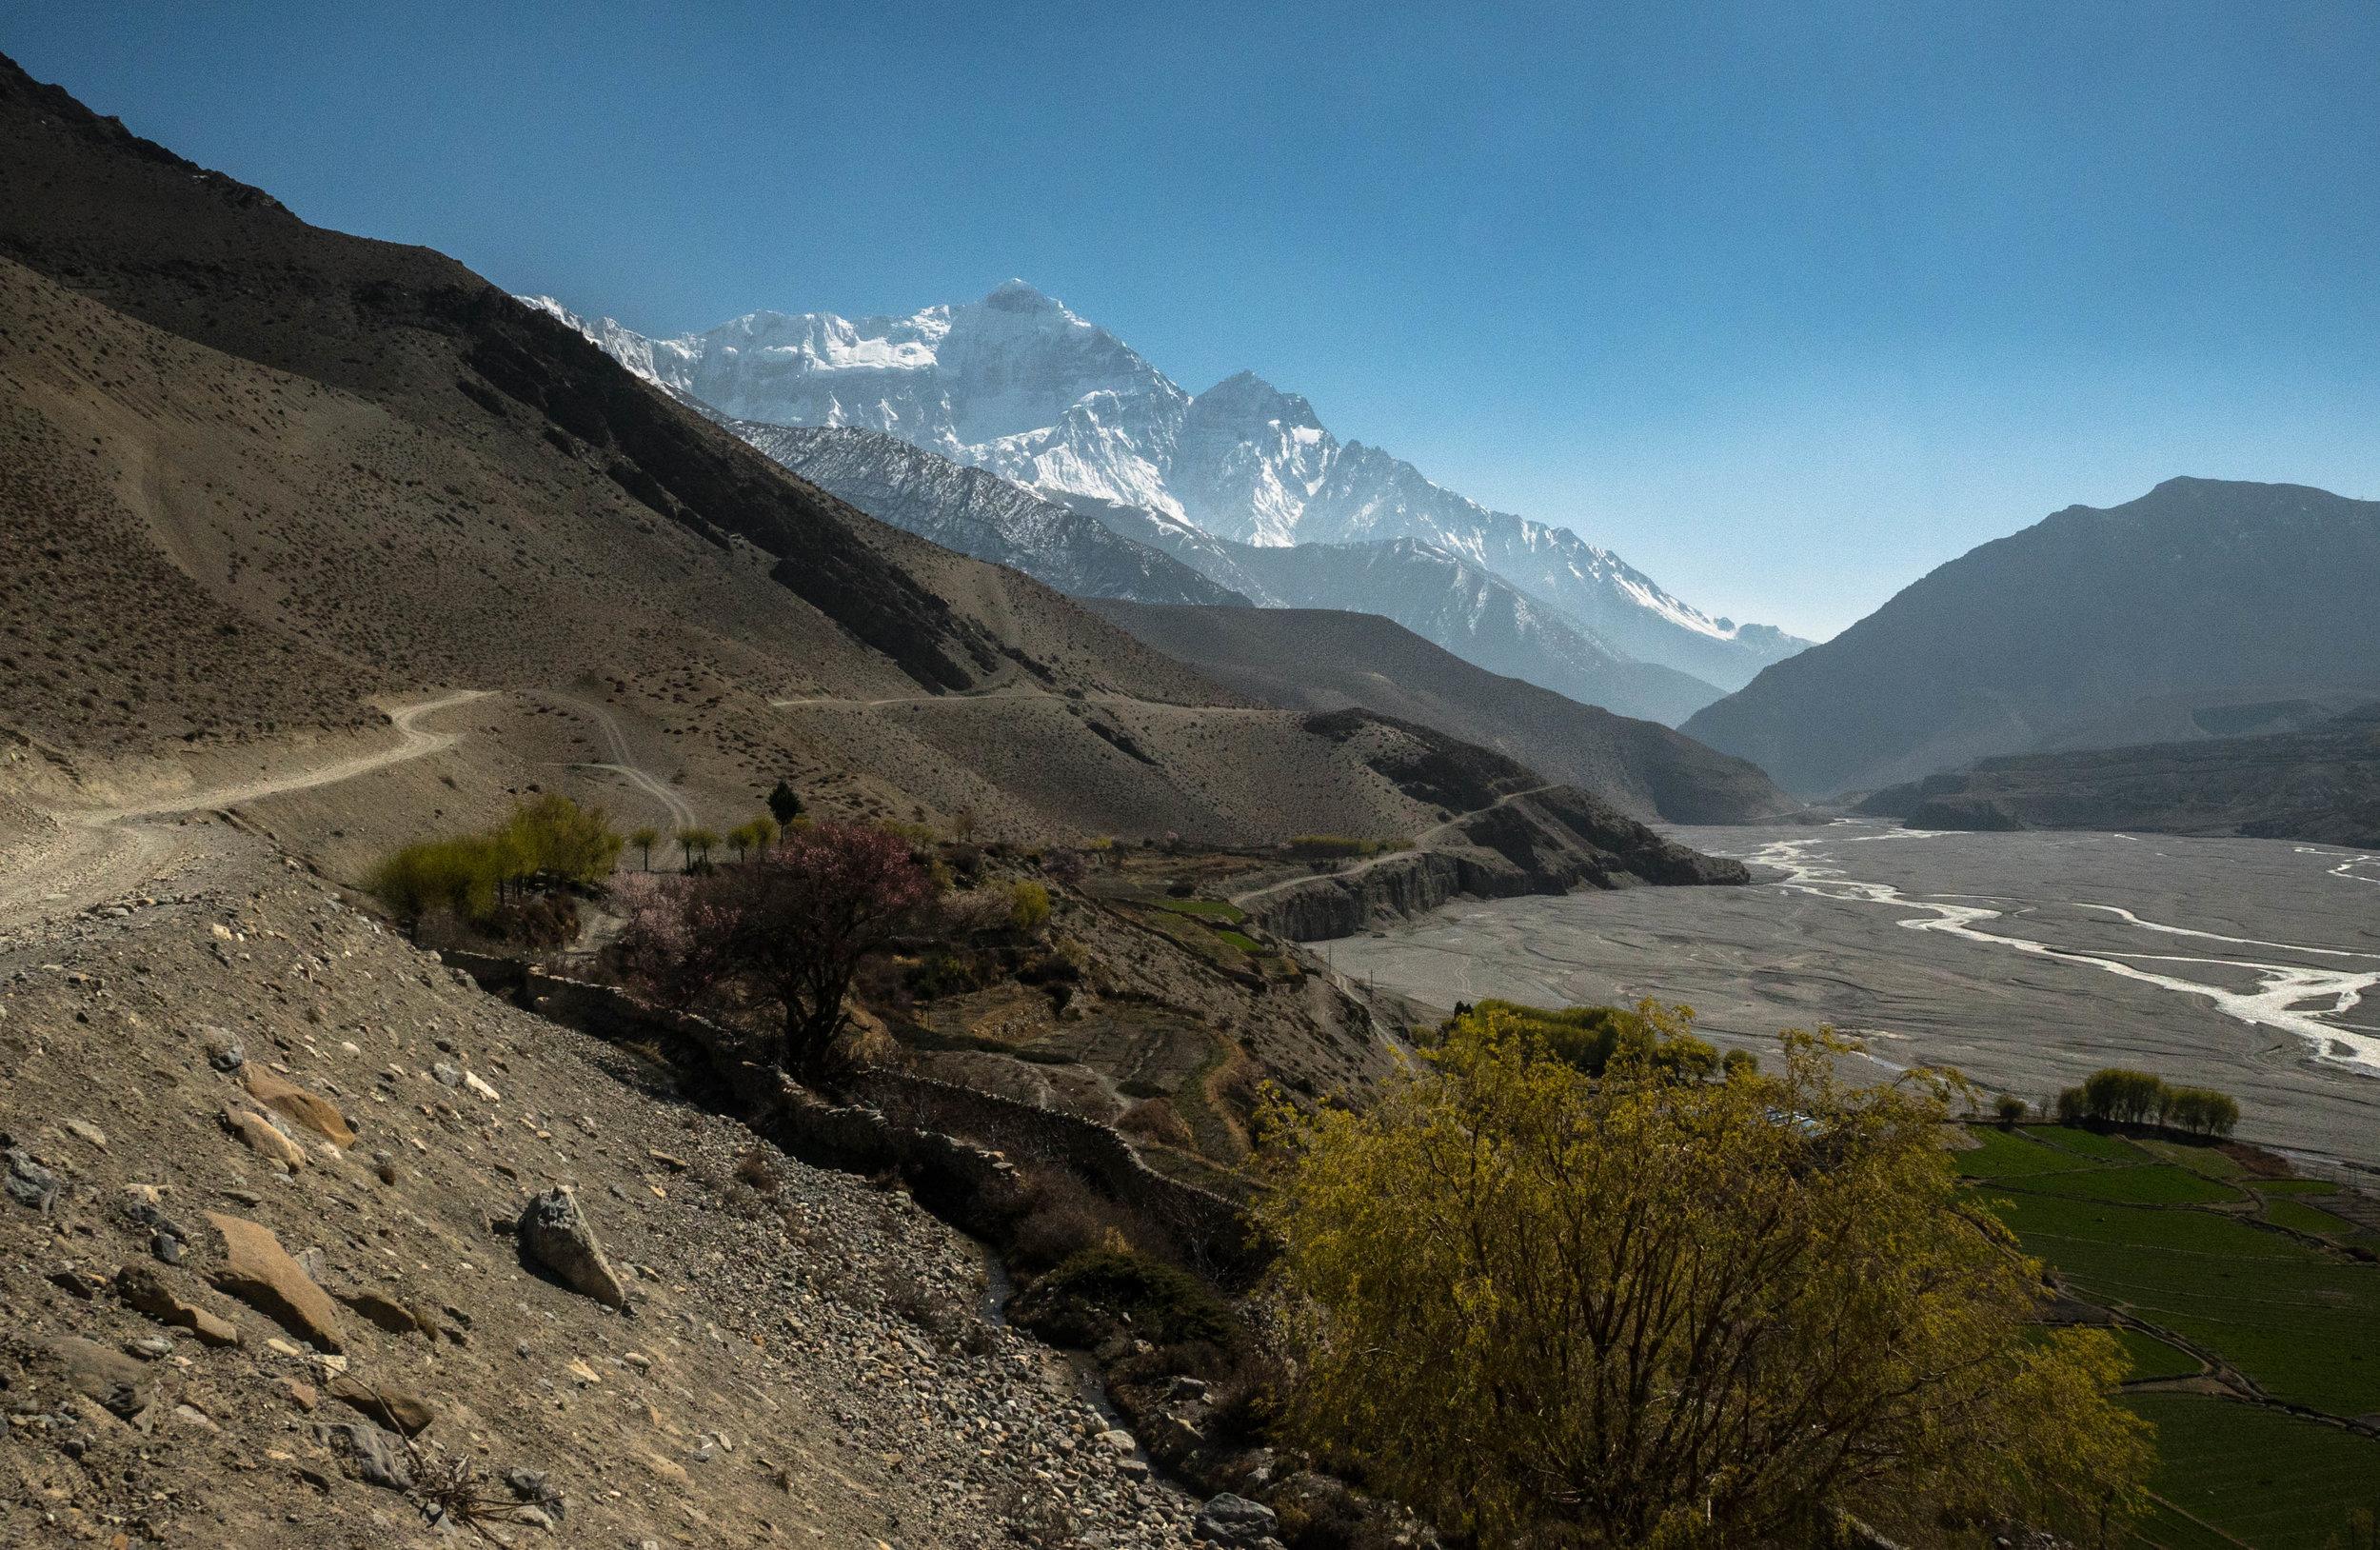 Annapurna Circuit Trek: Lower Mustang